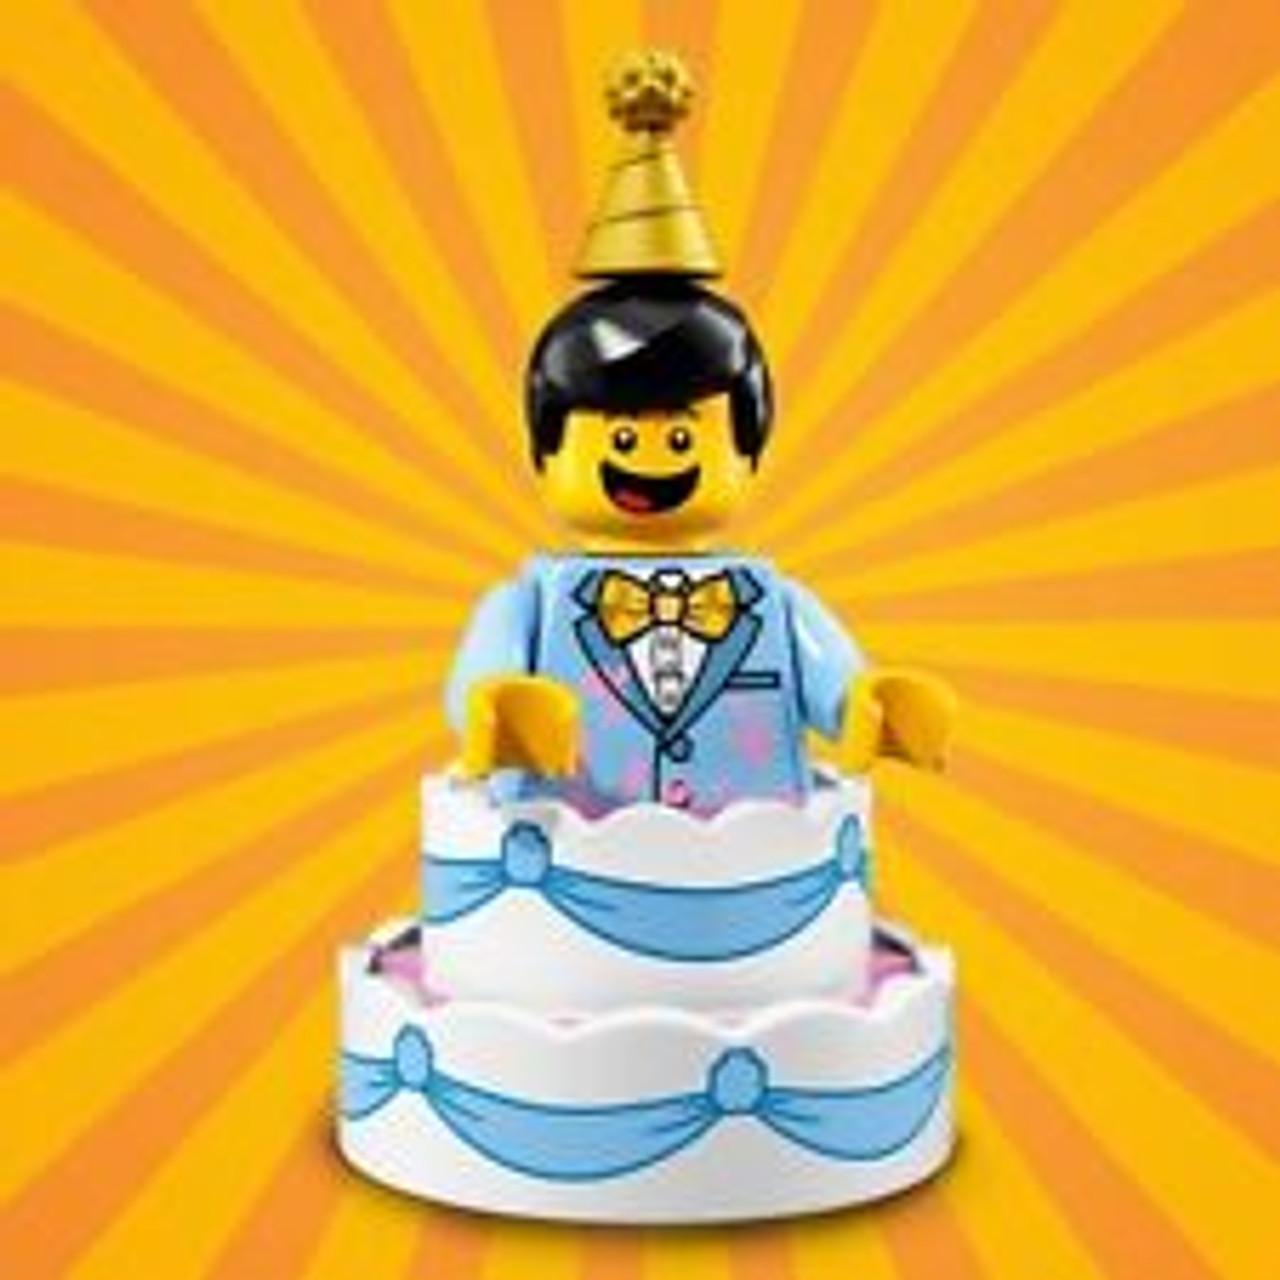 Lego Minifigures Series 18 Birthday Cake Guy 71021 The Brick People